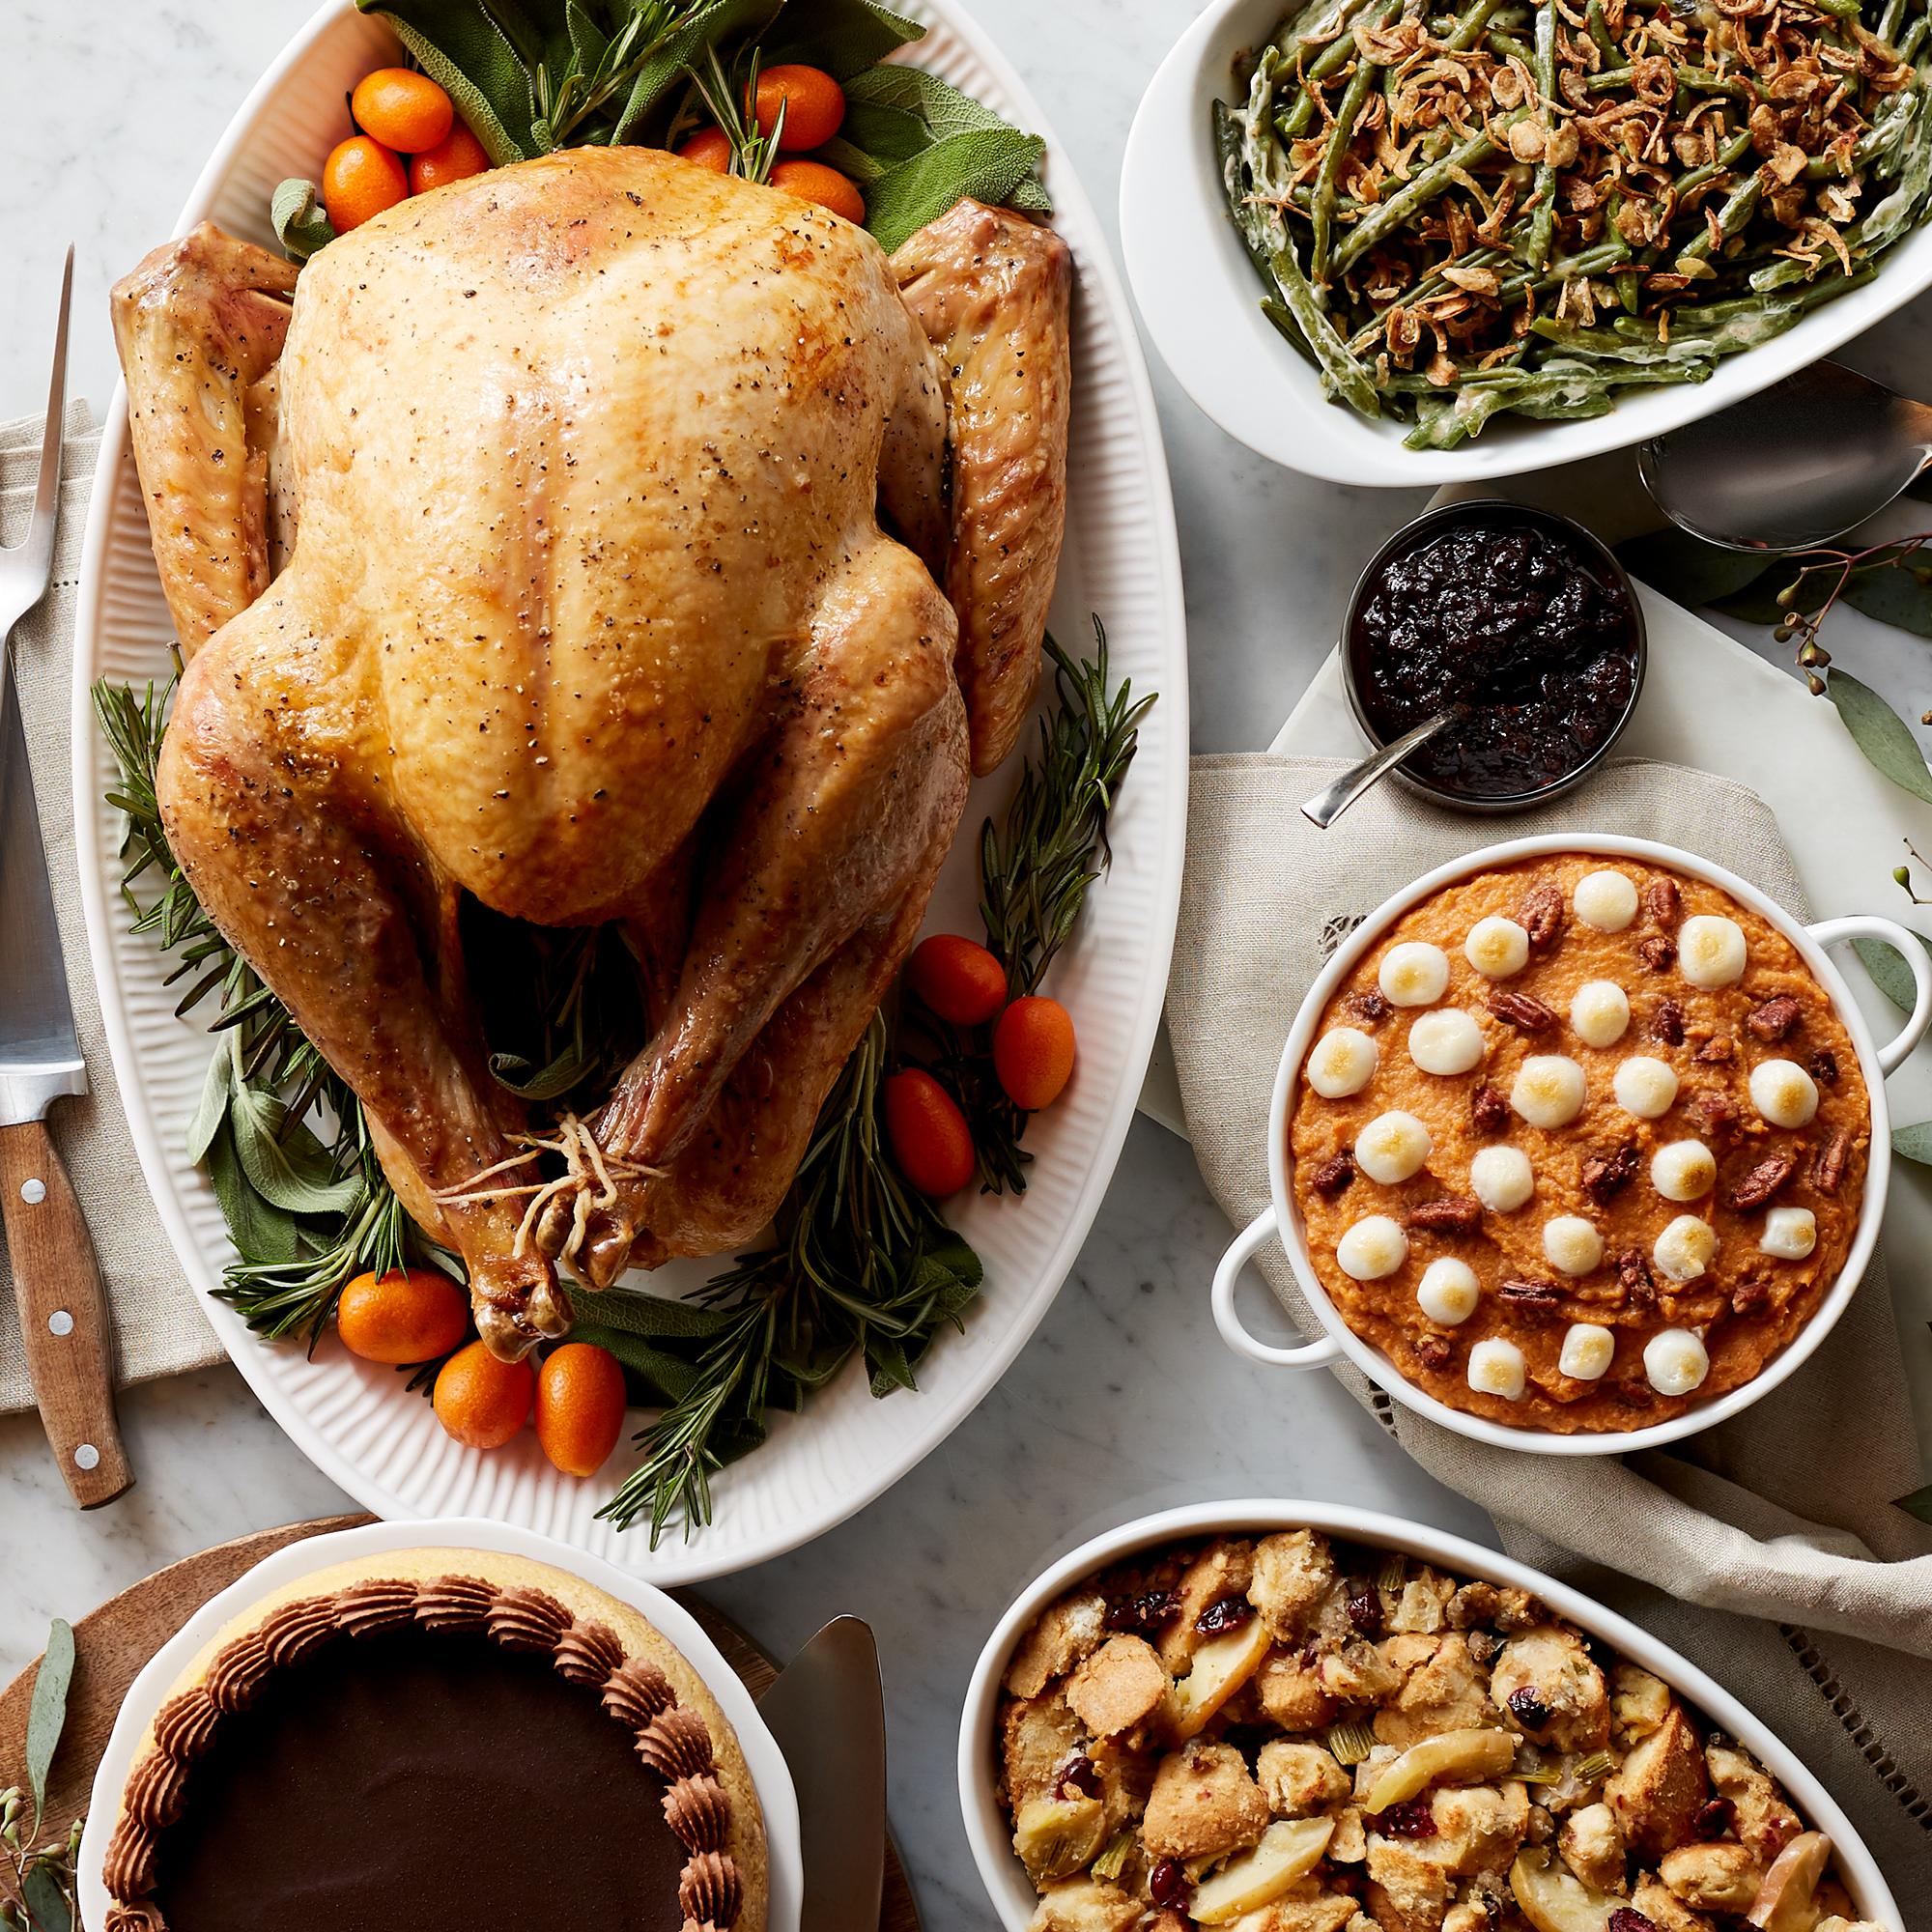 new product gift guide - Premium Turkey Dinner